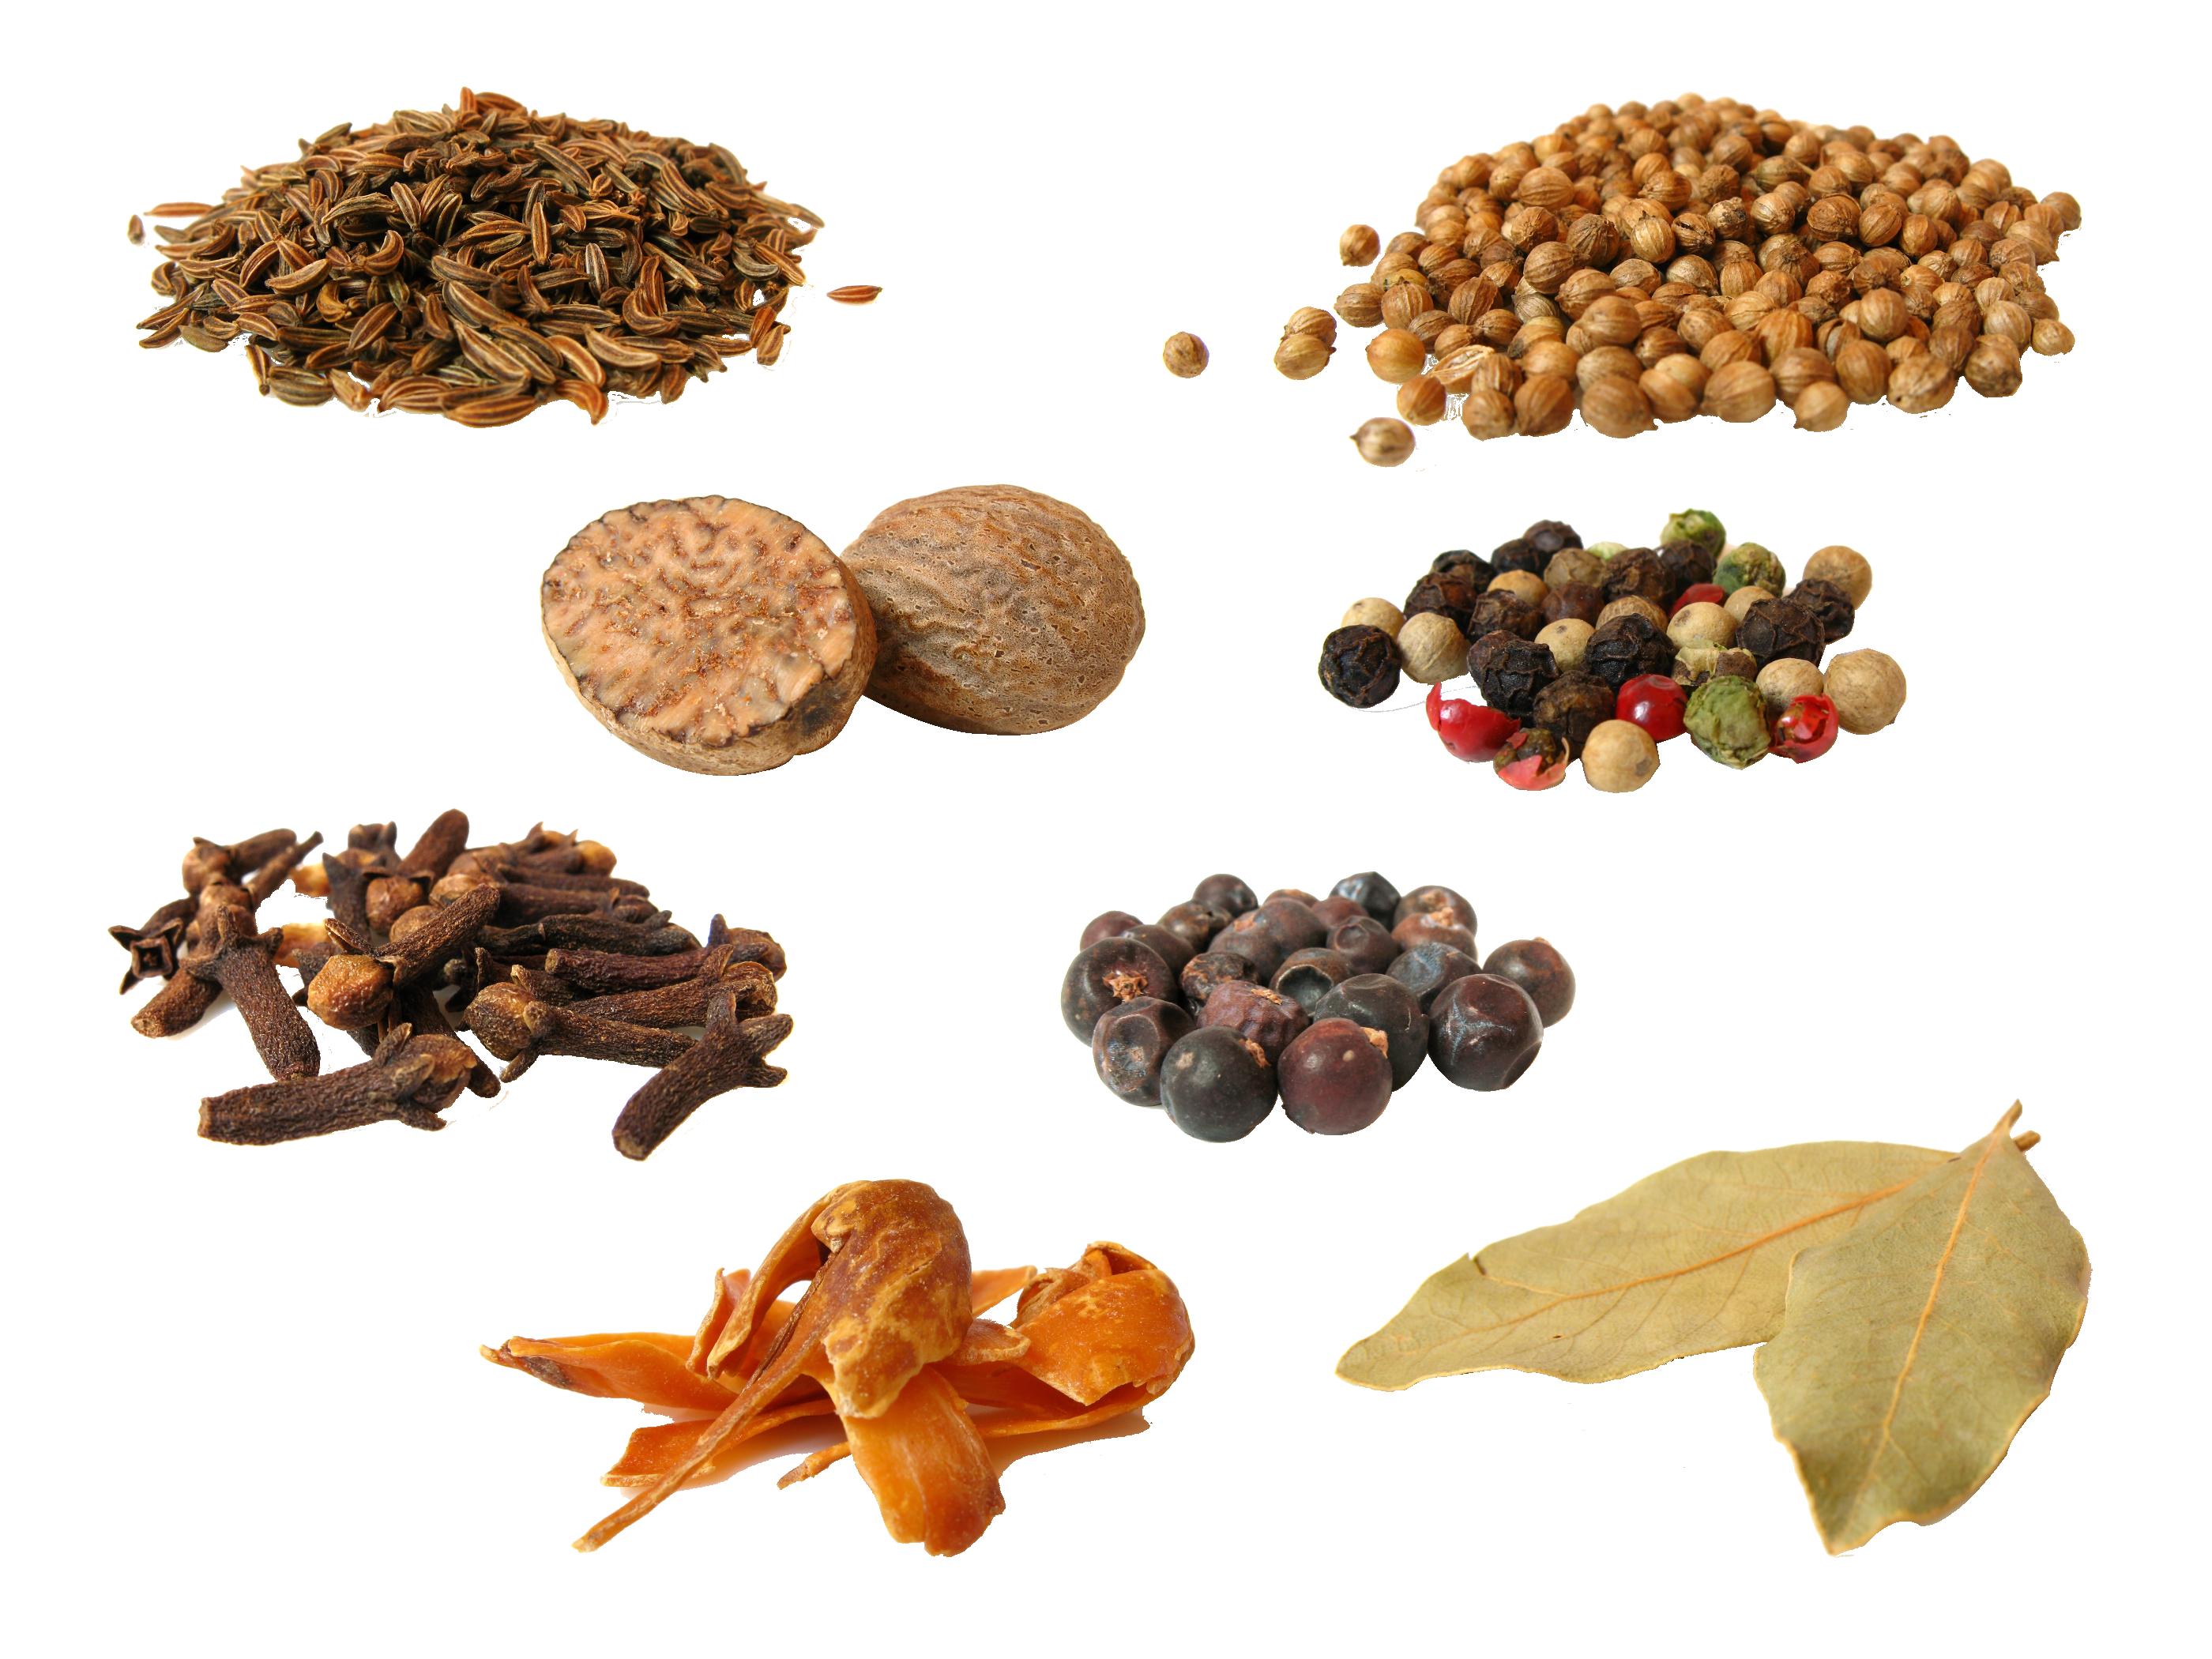 Spices By Sadstar On Deviantart